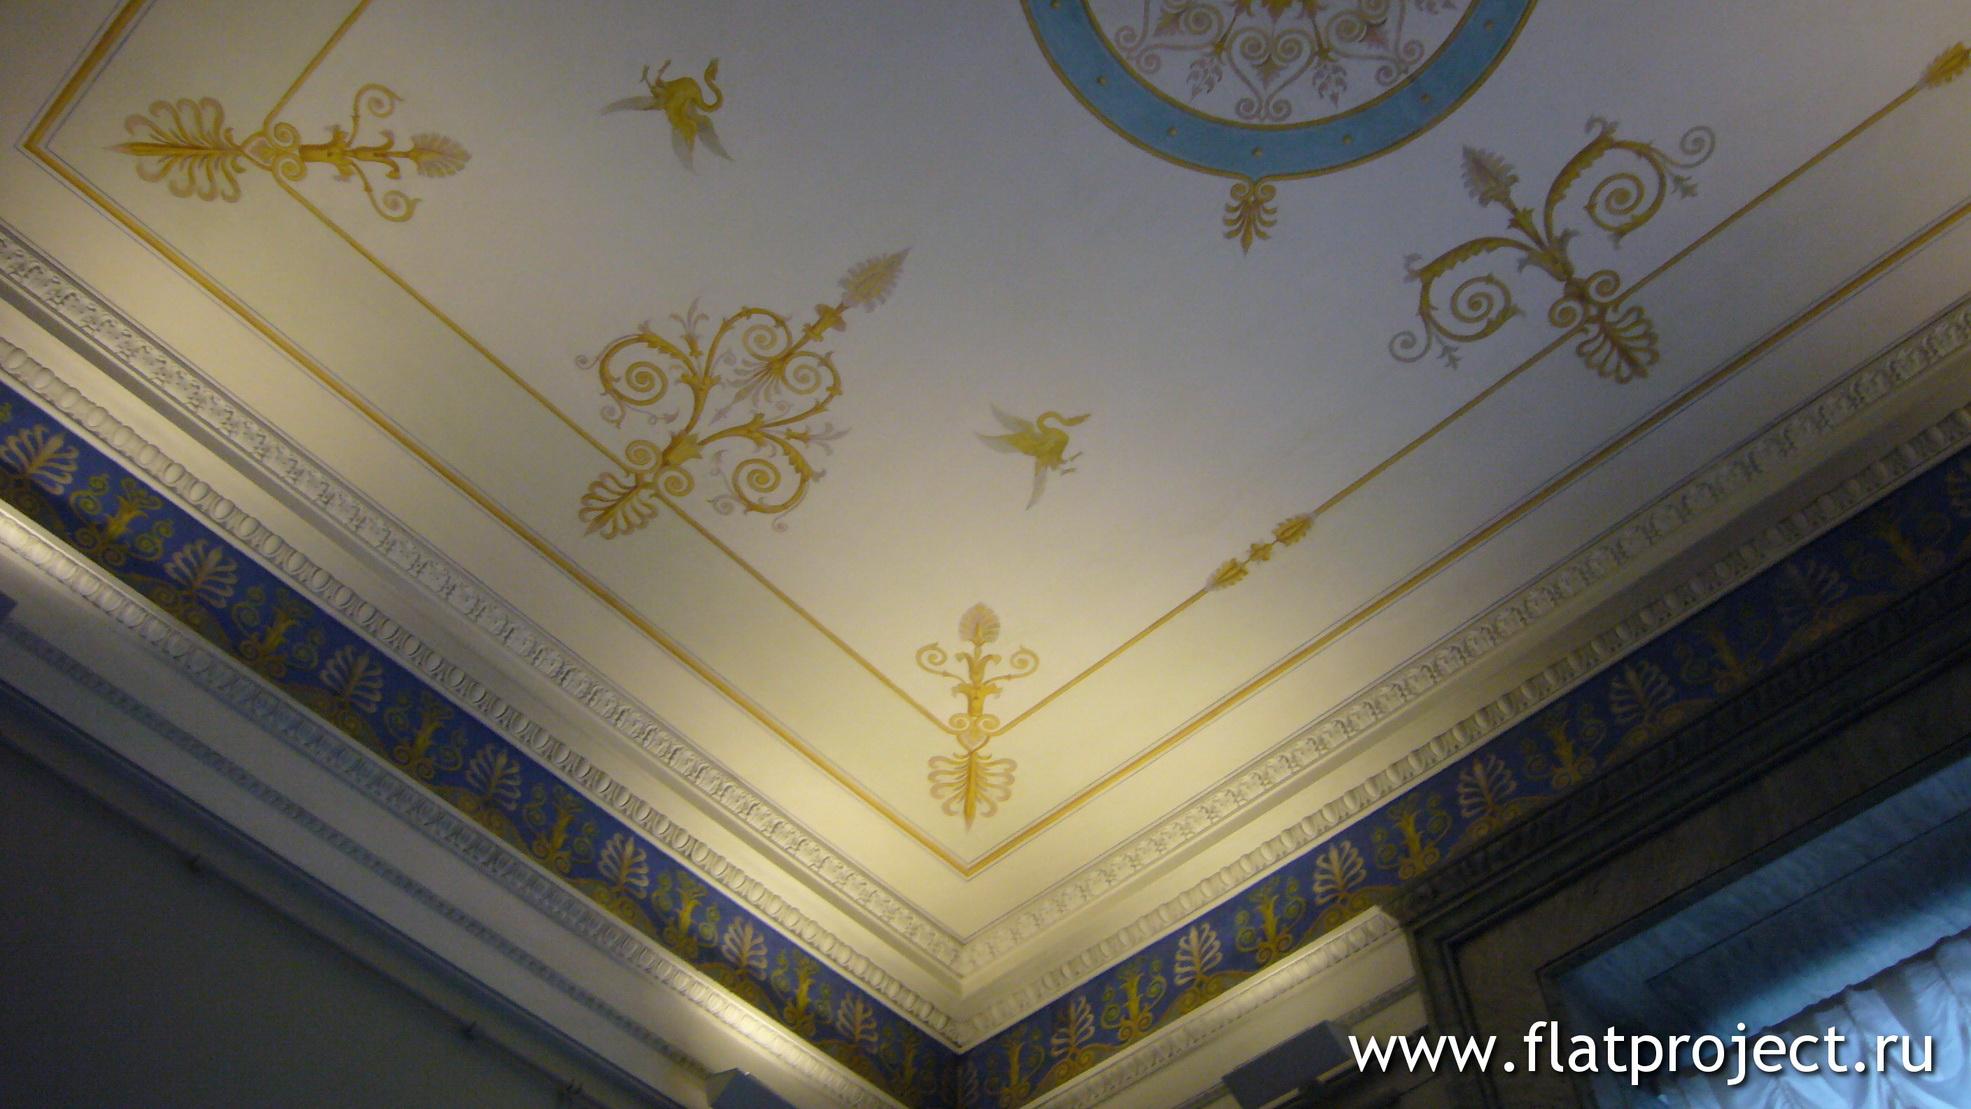 The State Hermitage museum interiors – photo 117